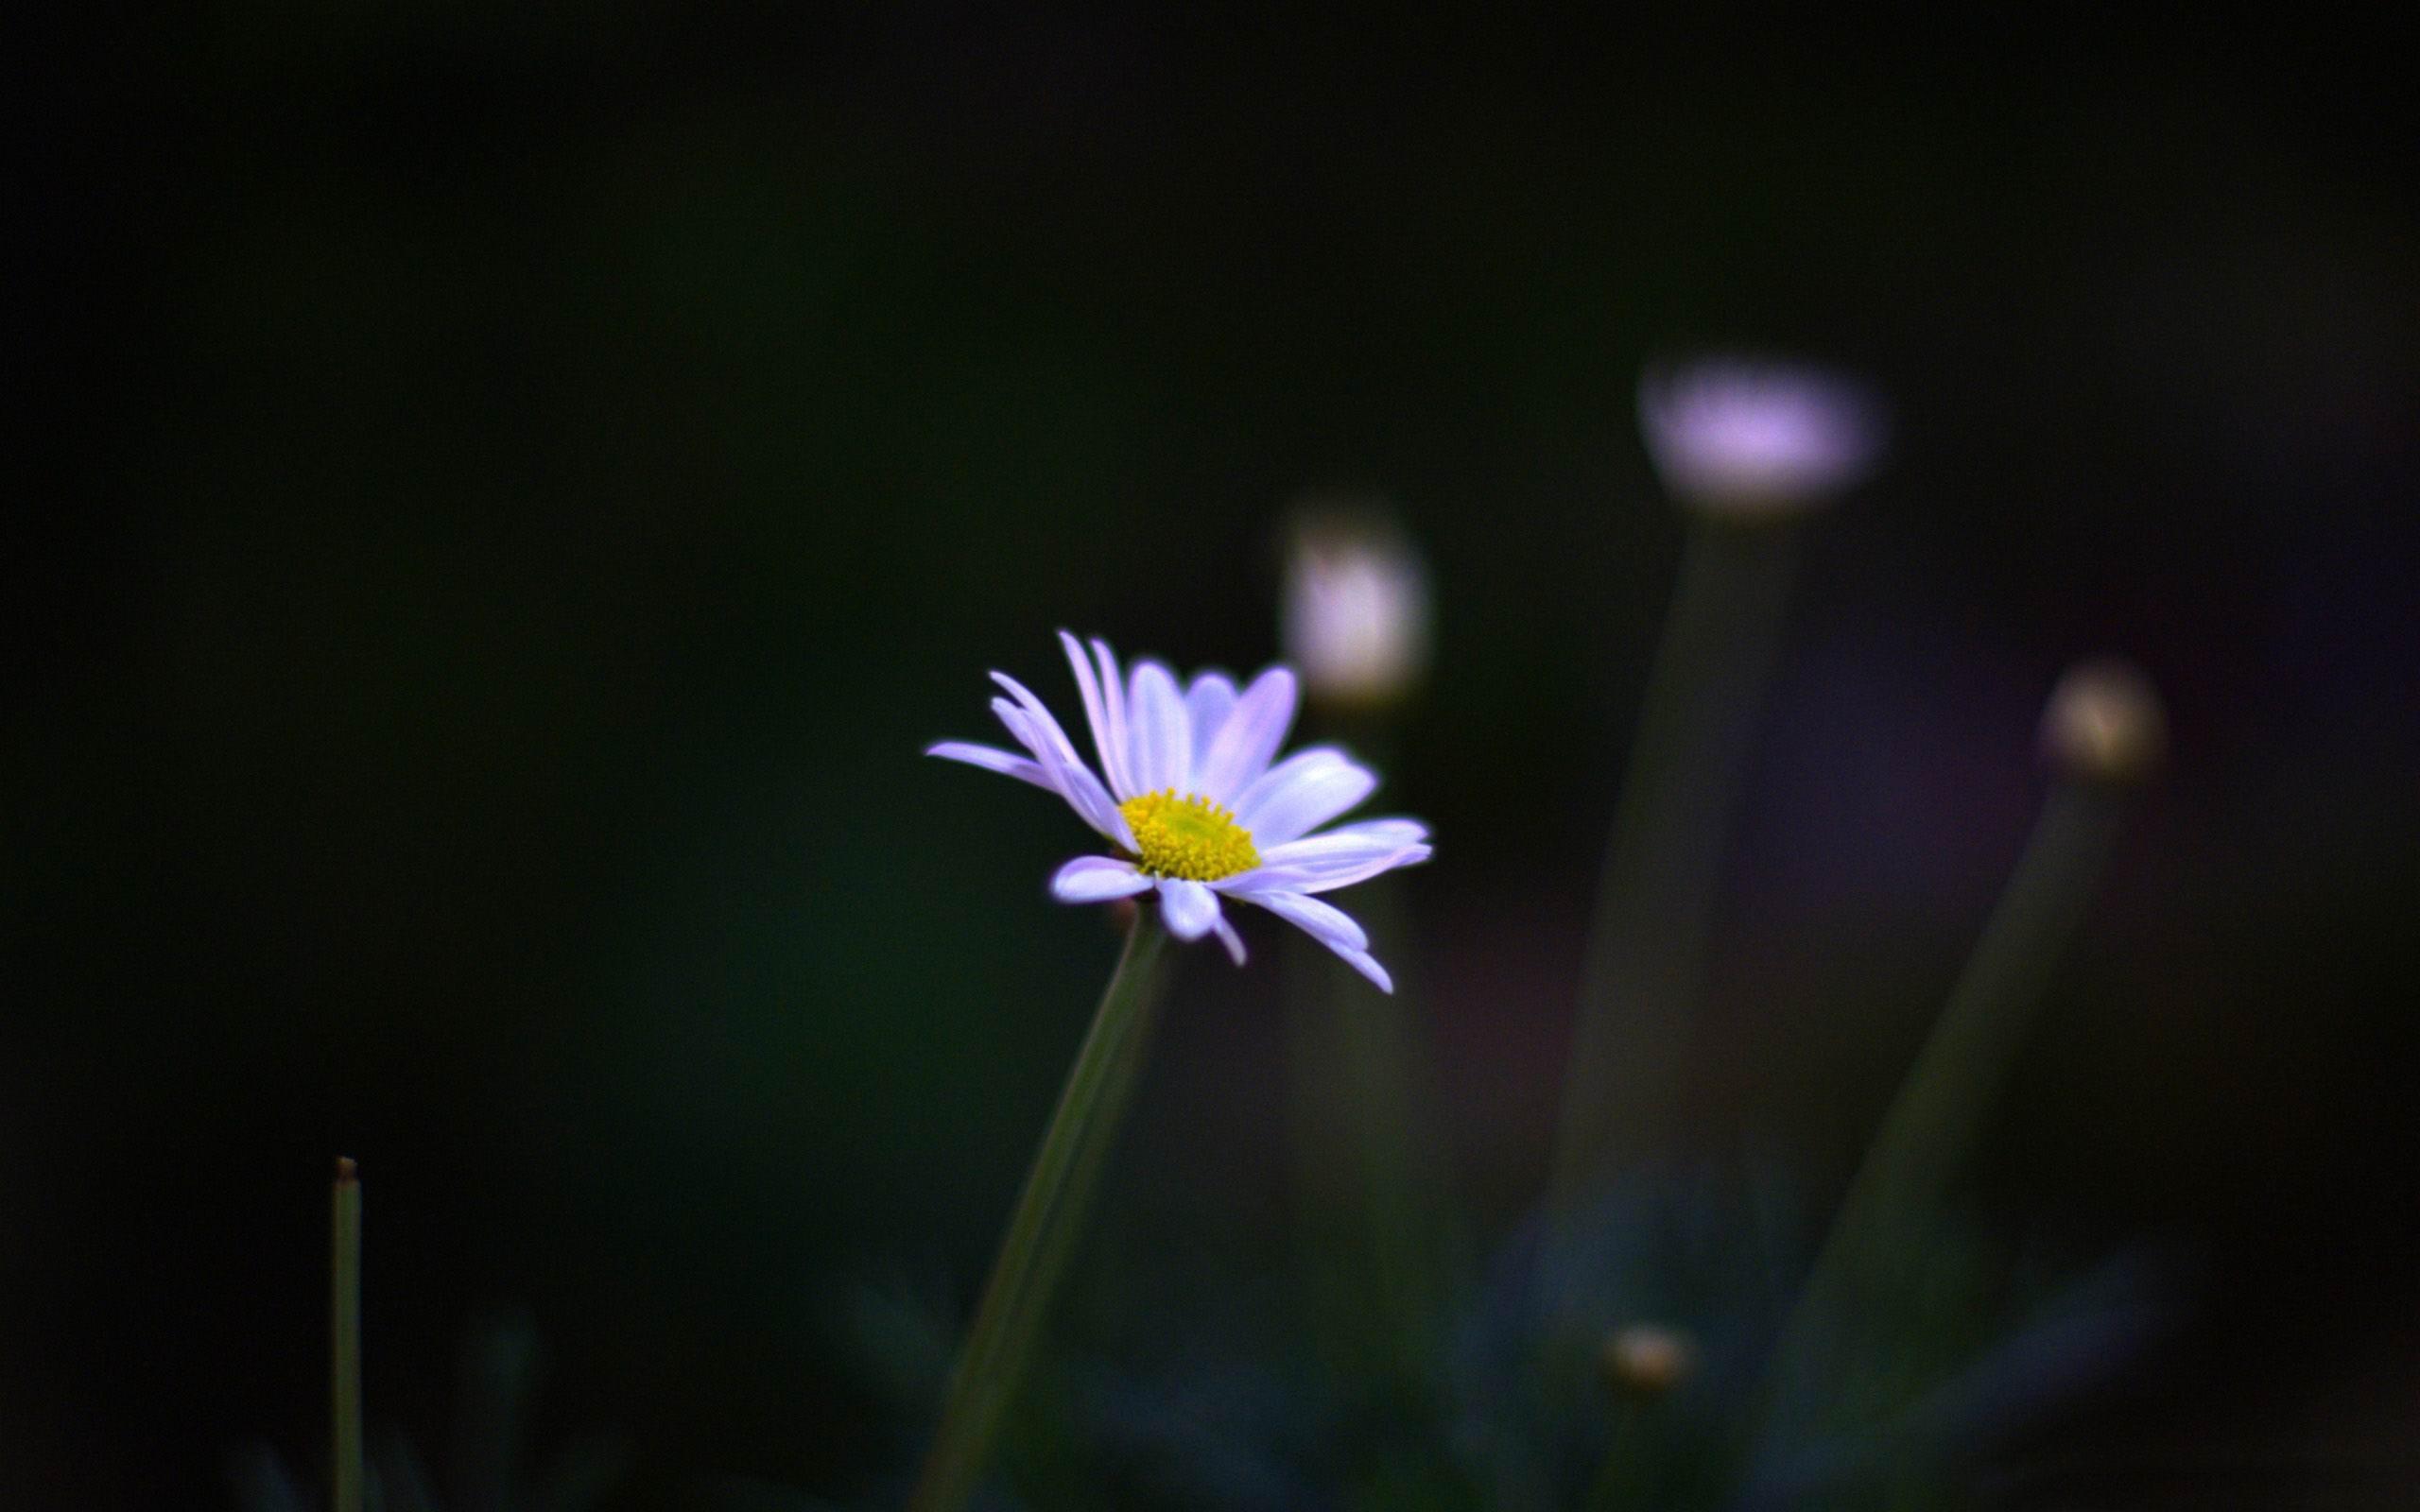 Flor En Fotografia De Flores Nocturnas Fondo De Pantalla Avance